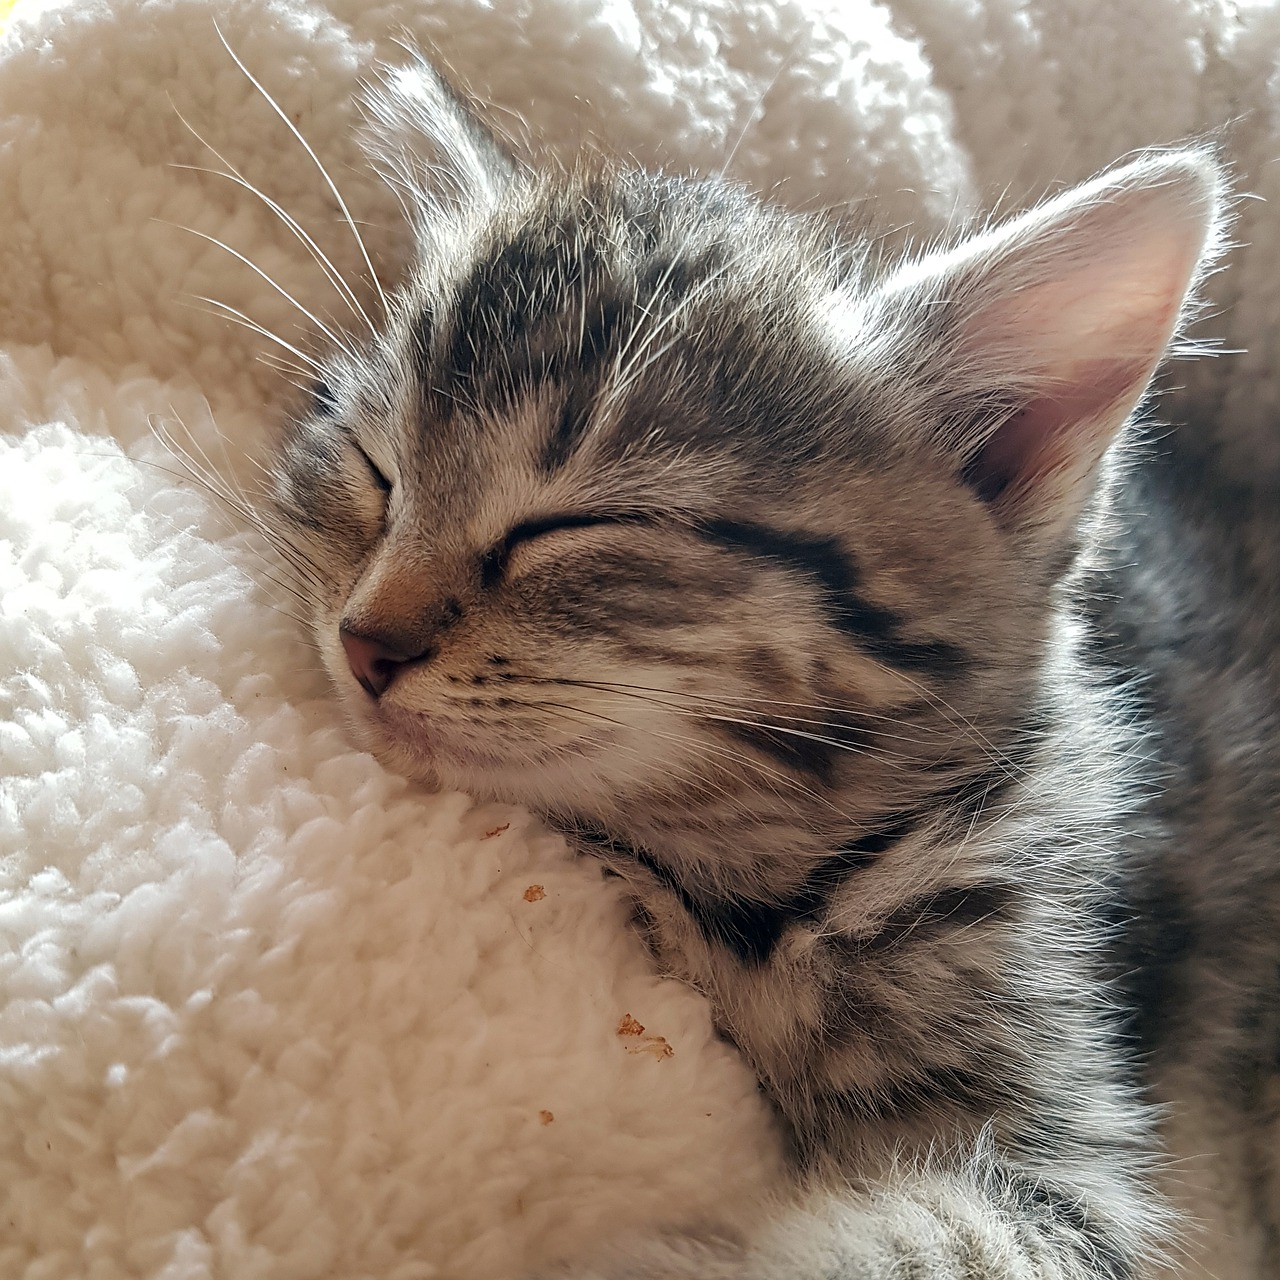 Kitten Soft Sleeping Cat - Free photo on Pixabay